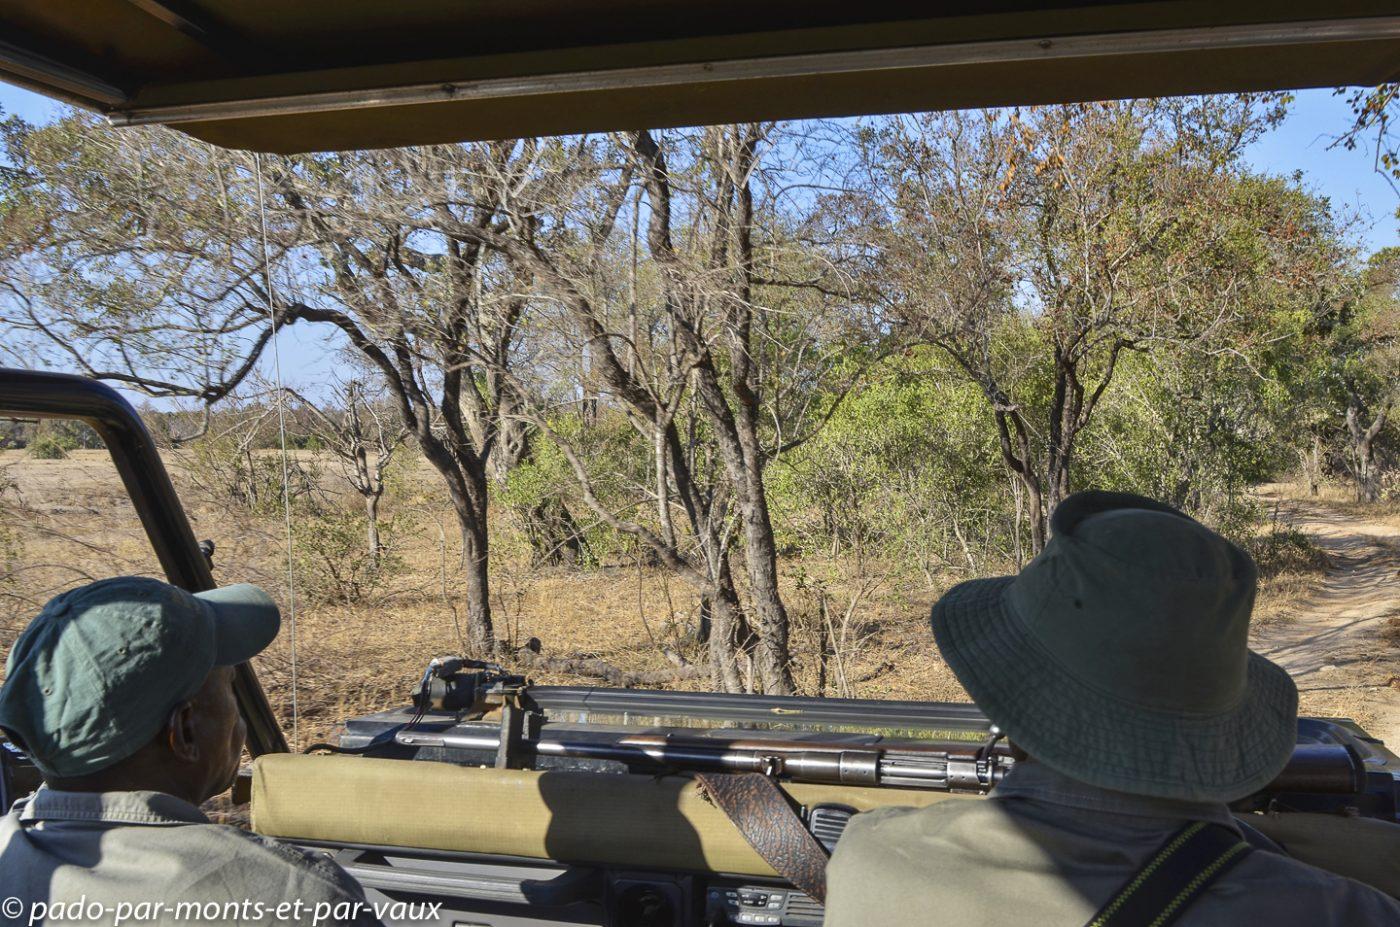 Rhino walking trails